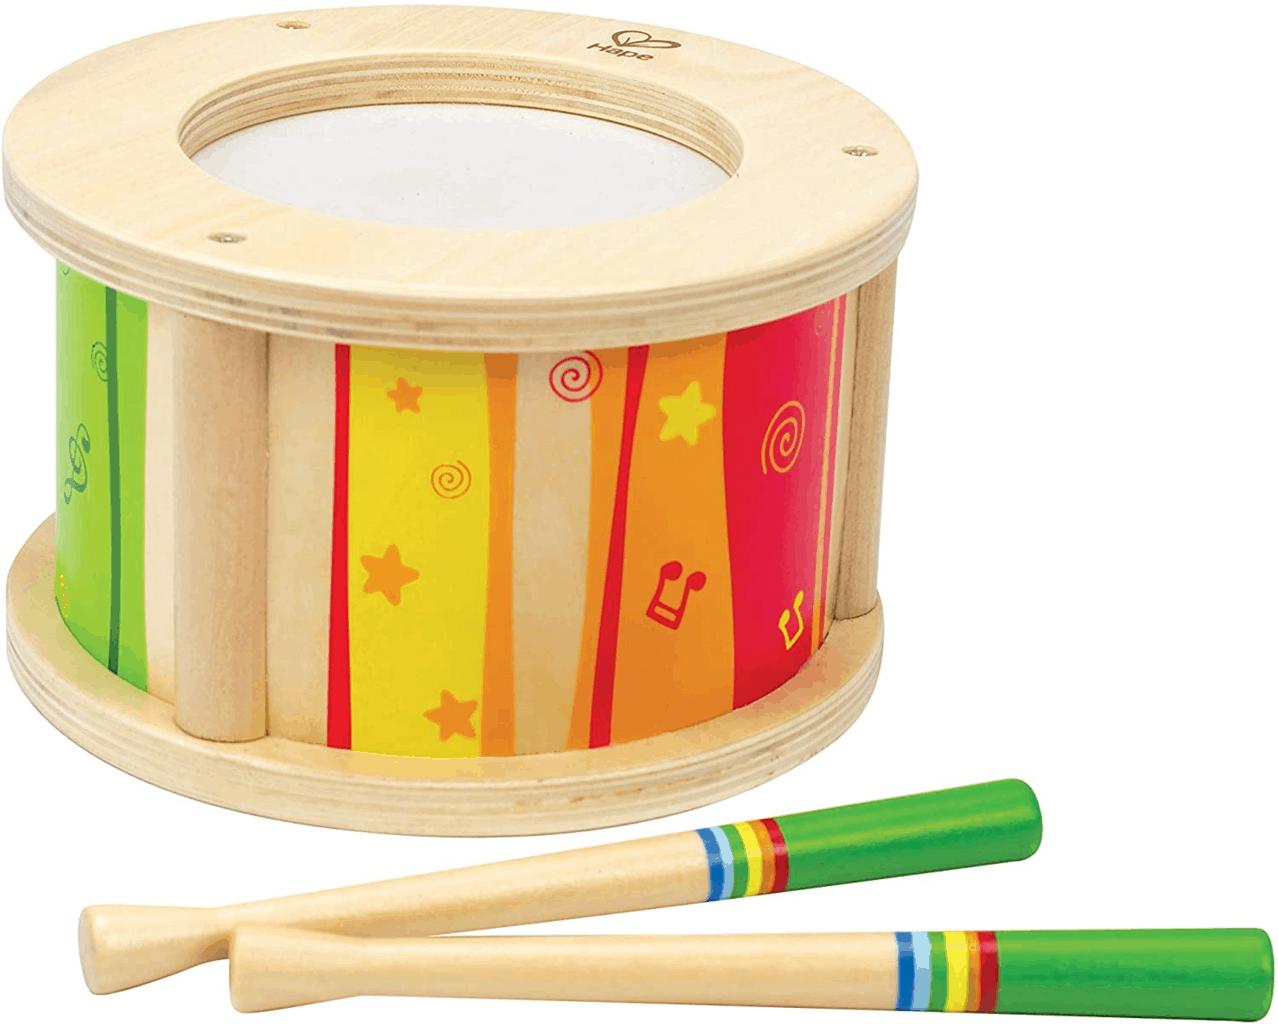 Hape Little Drummer Kids Wooden Drum Music Set